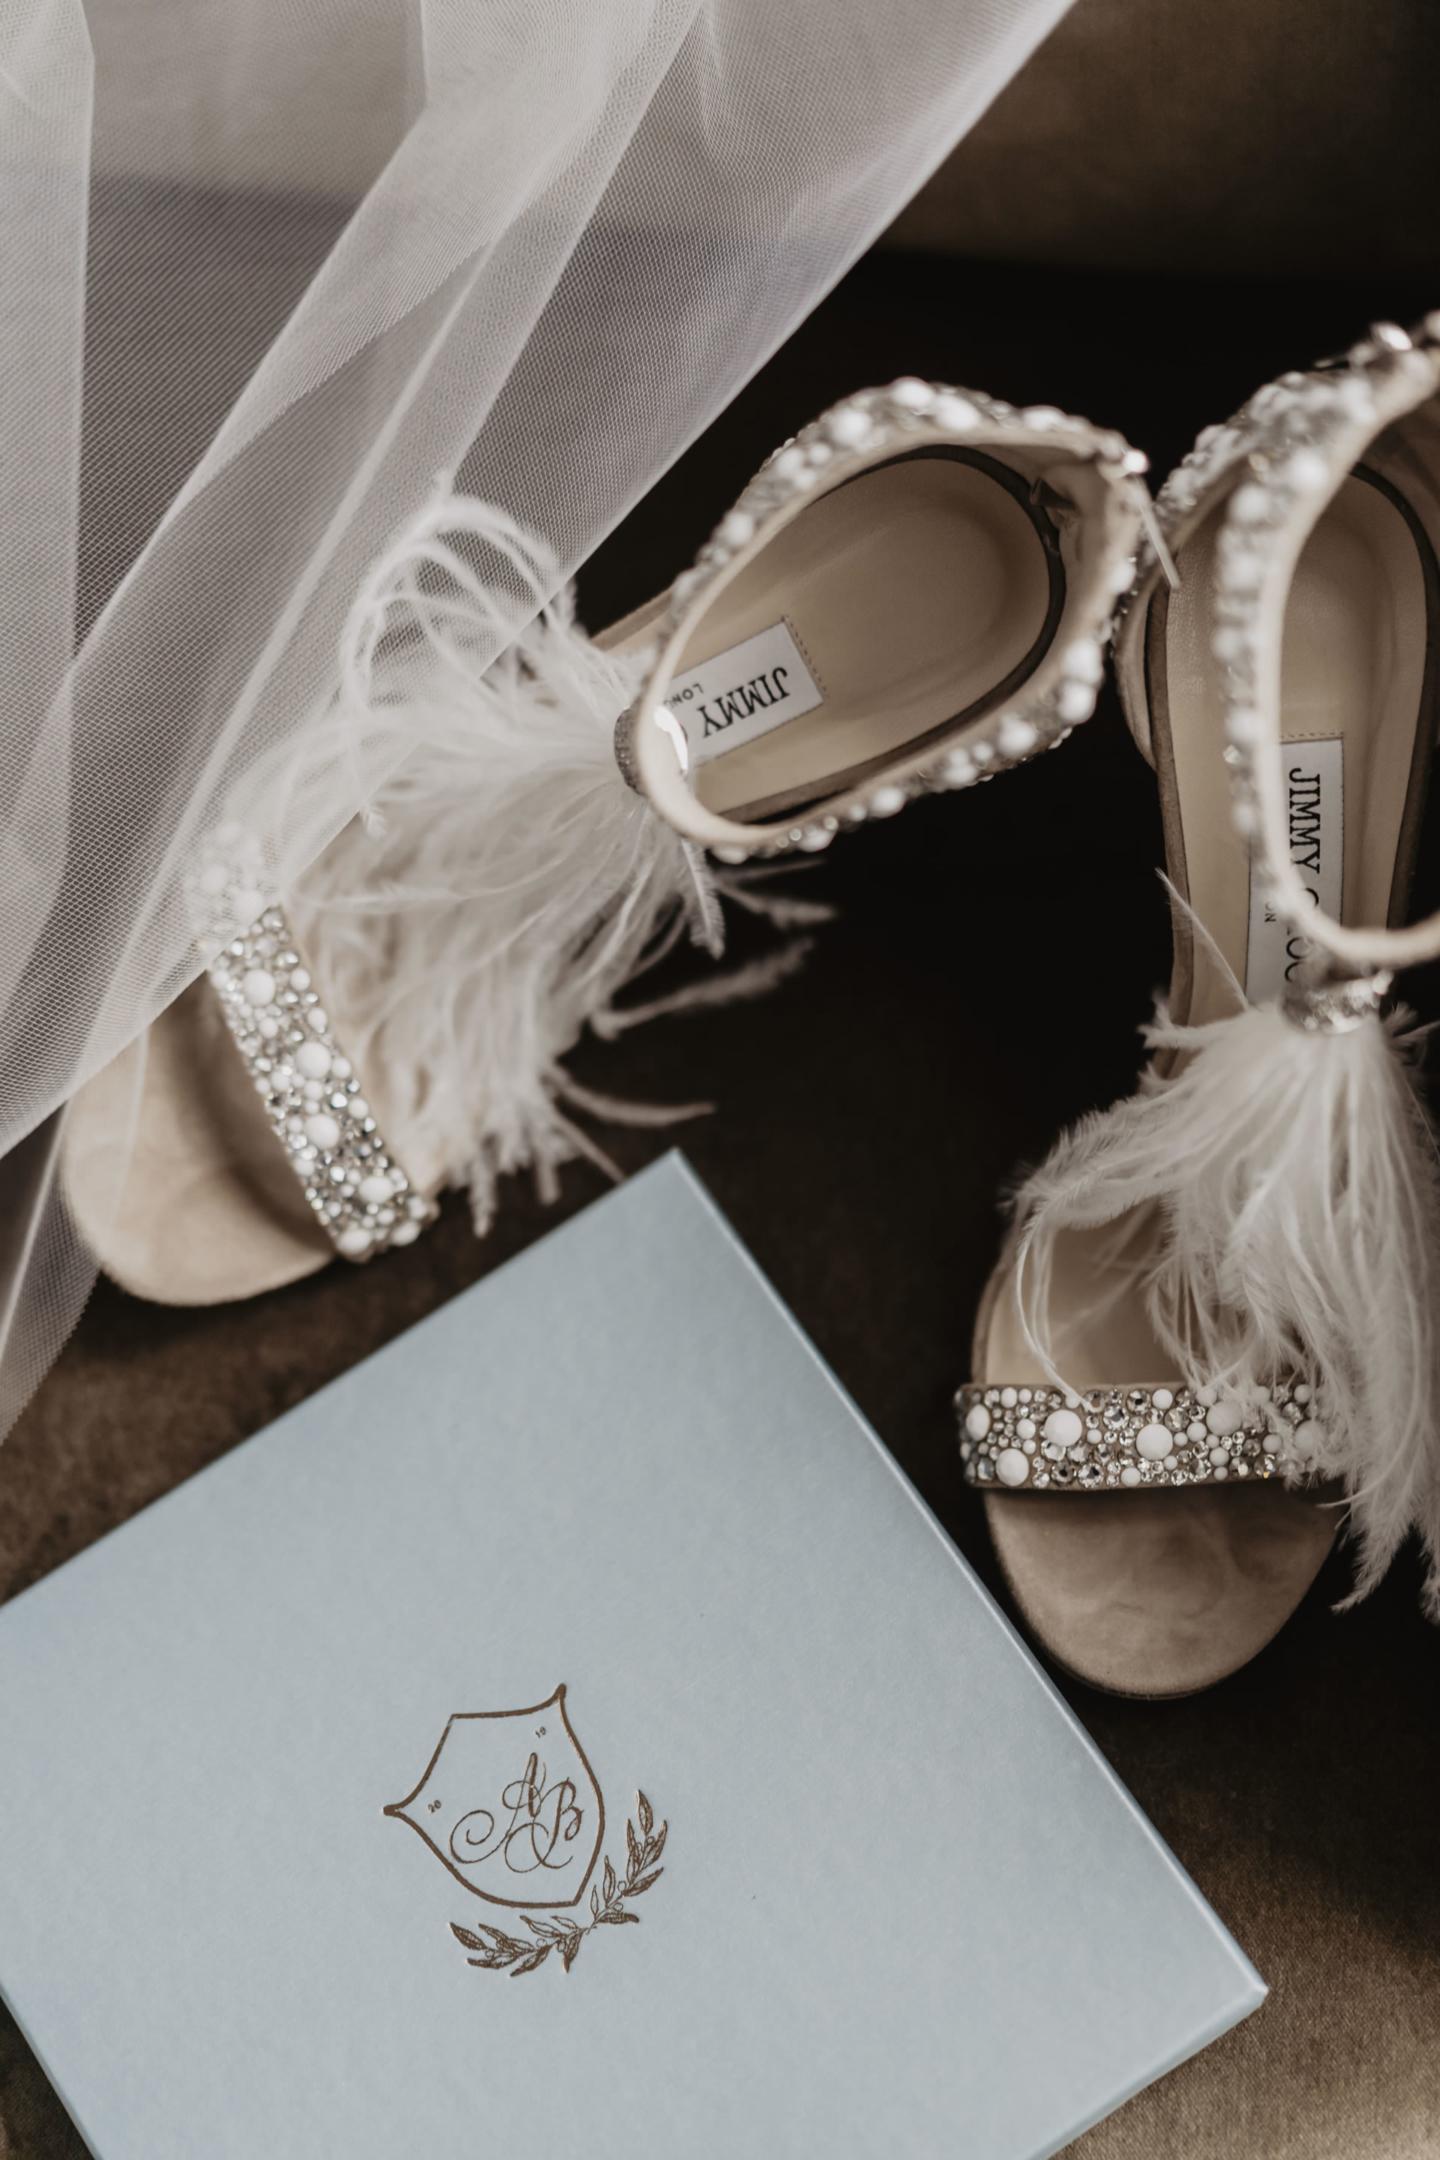 A sparkling wedding in the shore of the Arno - 8 :: A sparkling wedding on the shore of the Arno :: Luxury wedding photography - 7 :: A sparkling wedding in the shore of the Arno - 8